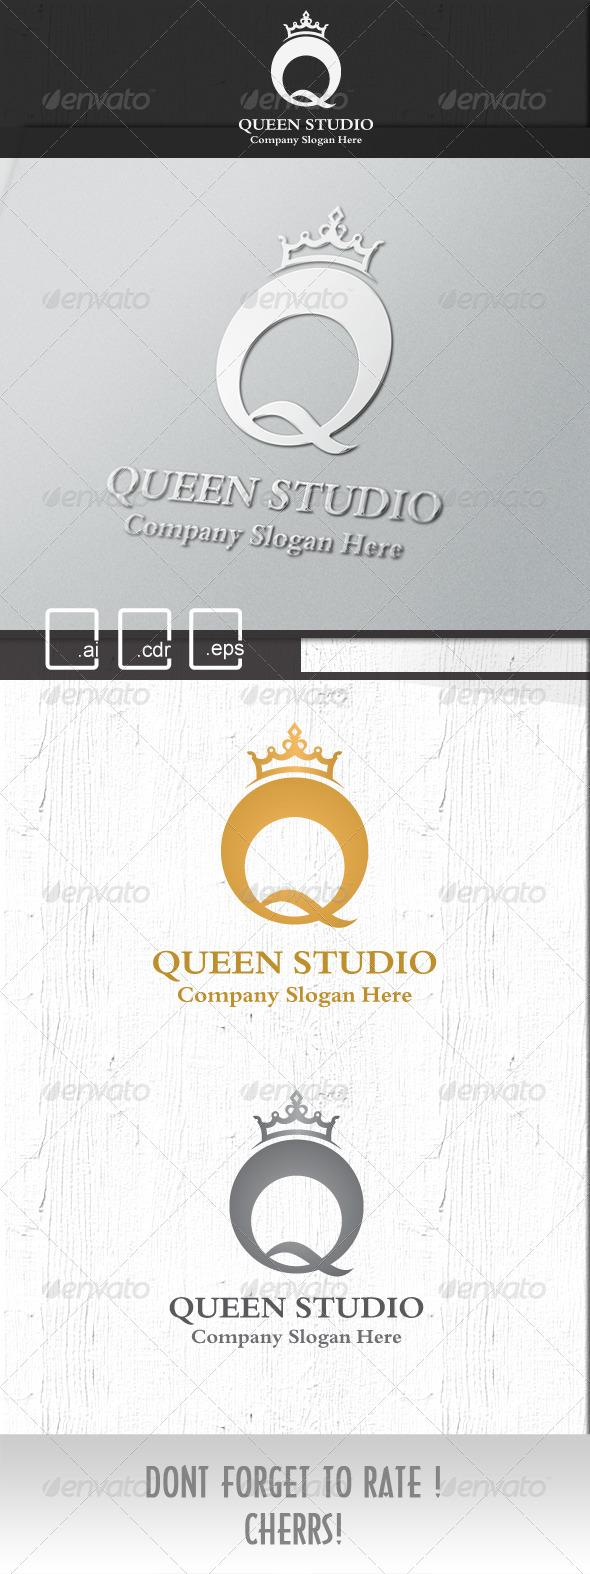 Queen Royal Studio logo